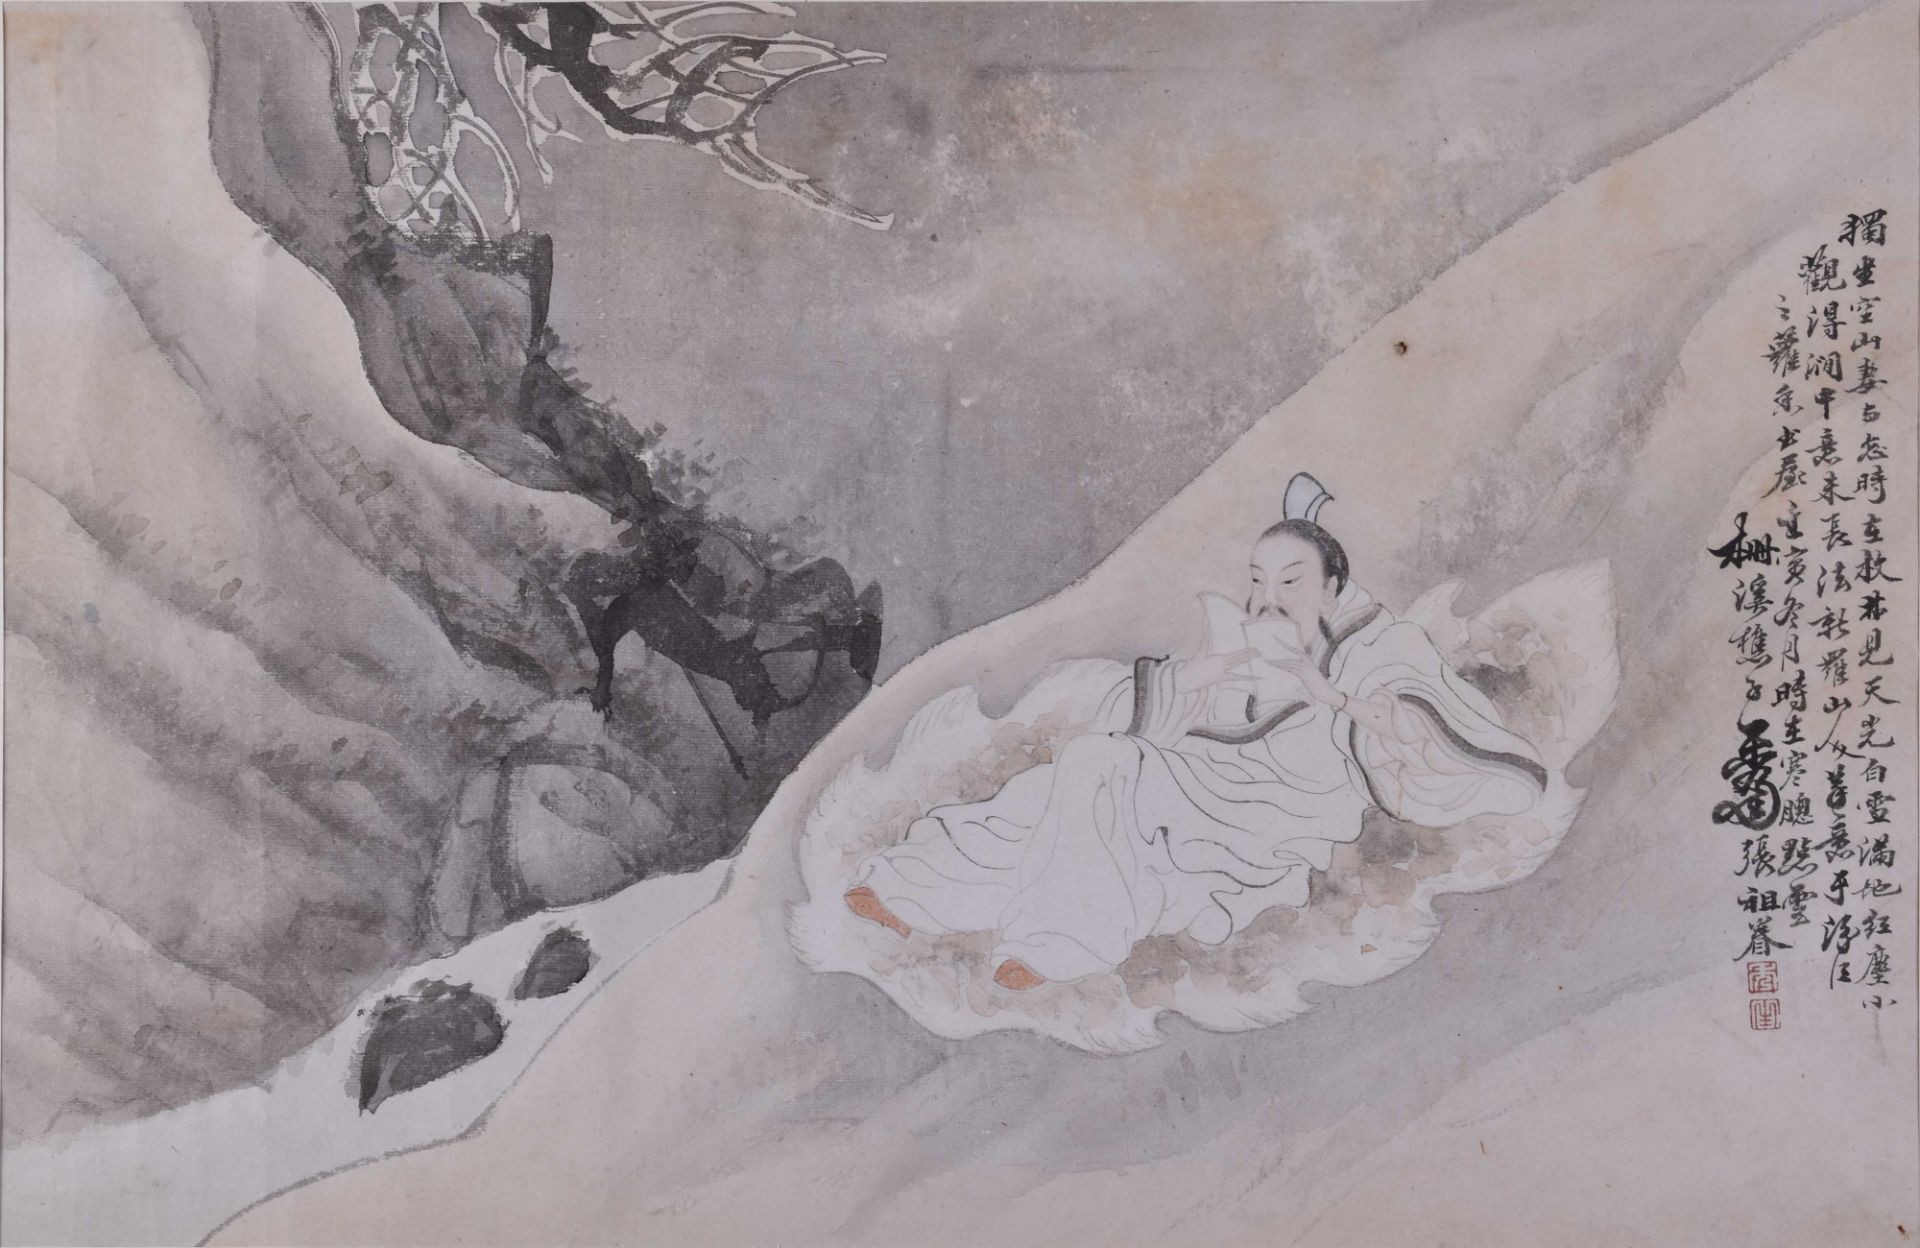 Zhang Zujiän Chinese artist of the 19th century